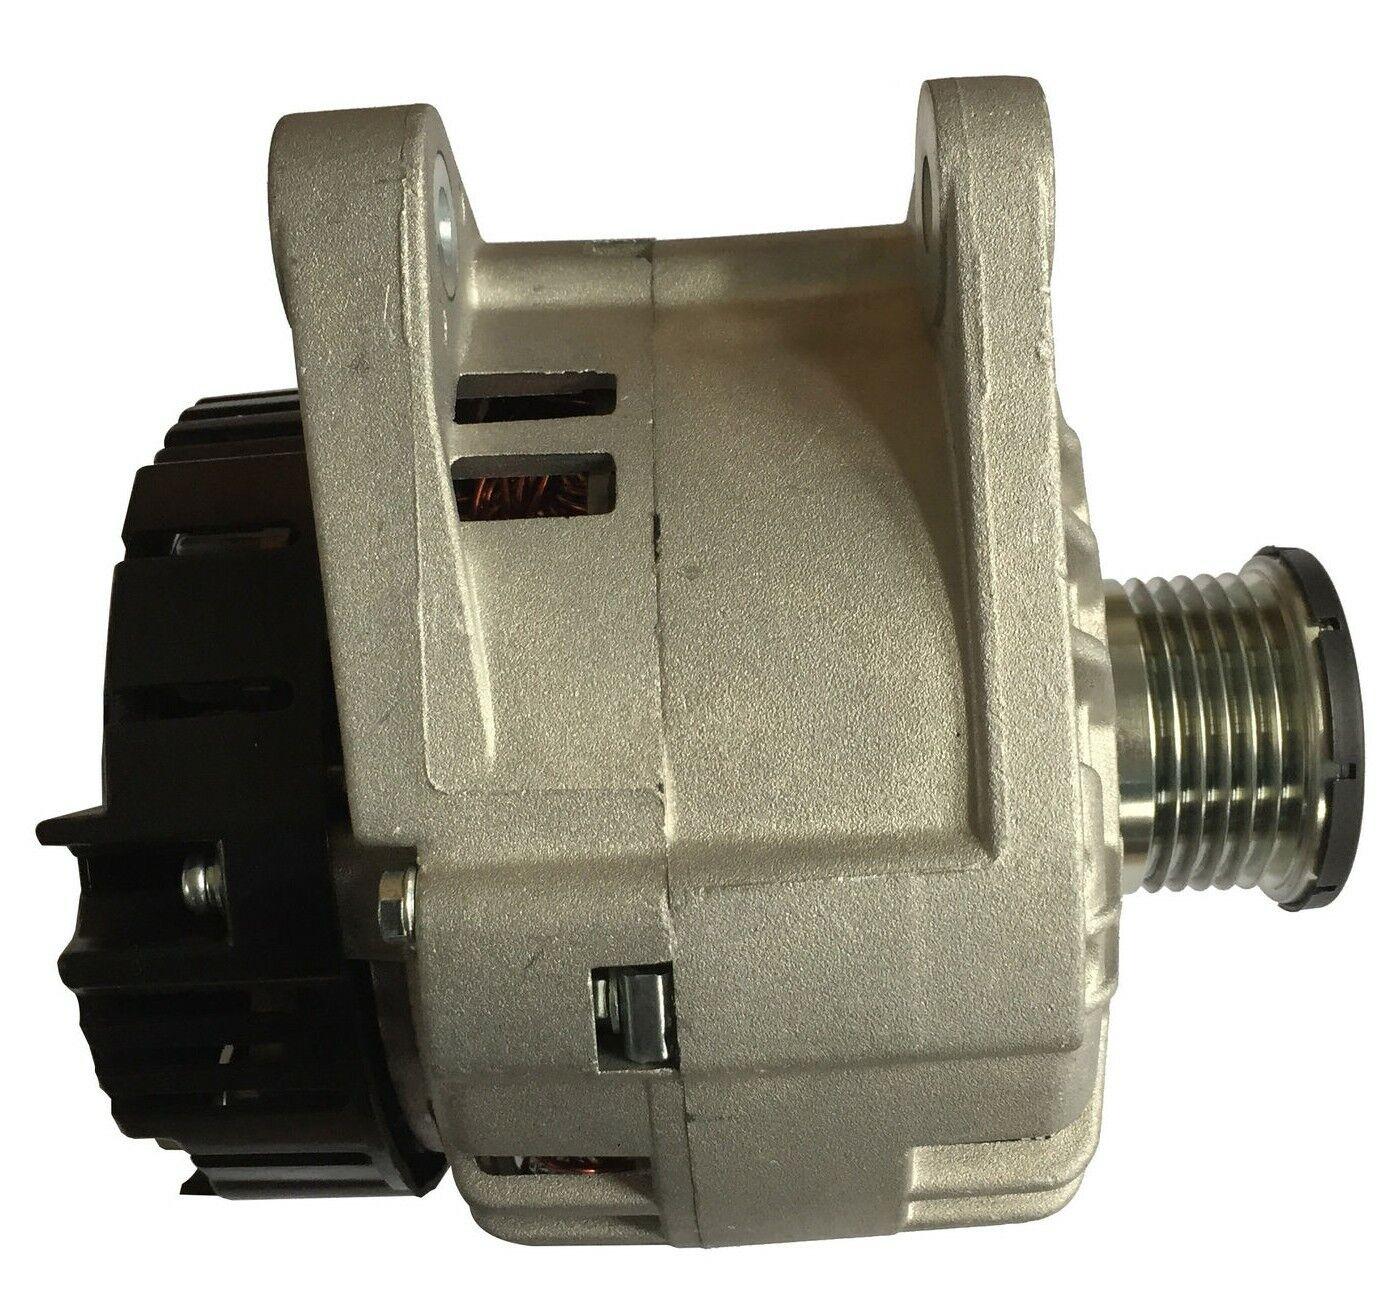 Swan Neck Towbar For Renault Espace IV 13Pin Electrics MPV 02-15 31077H1